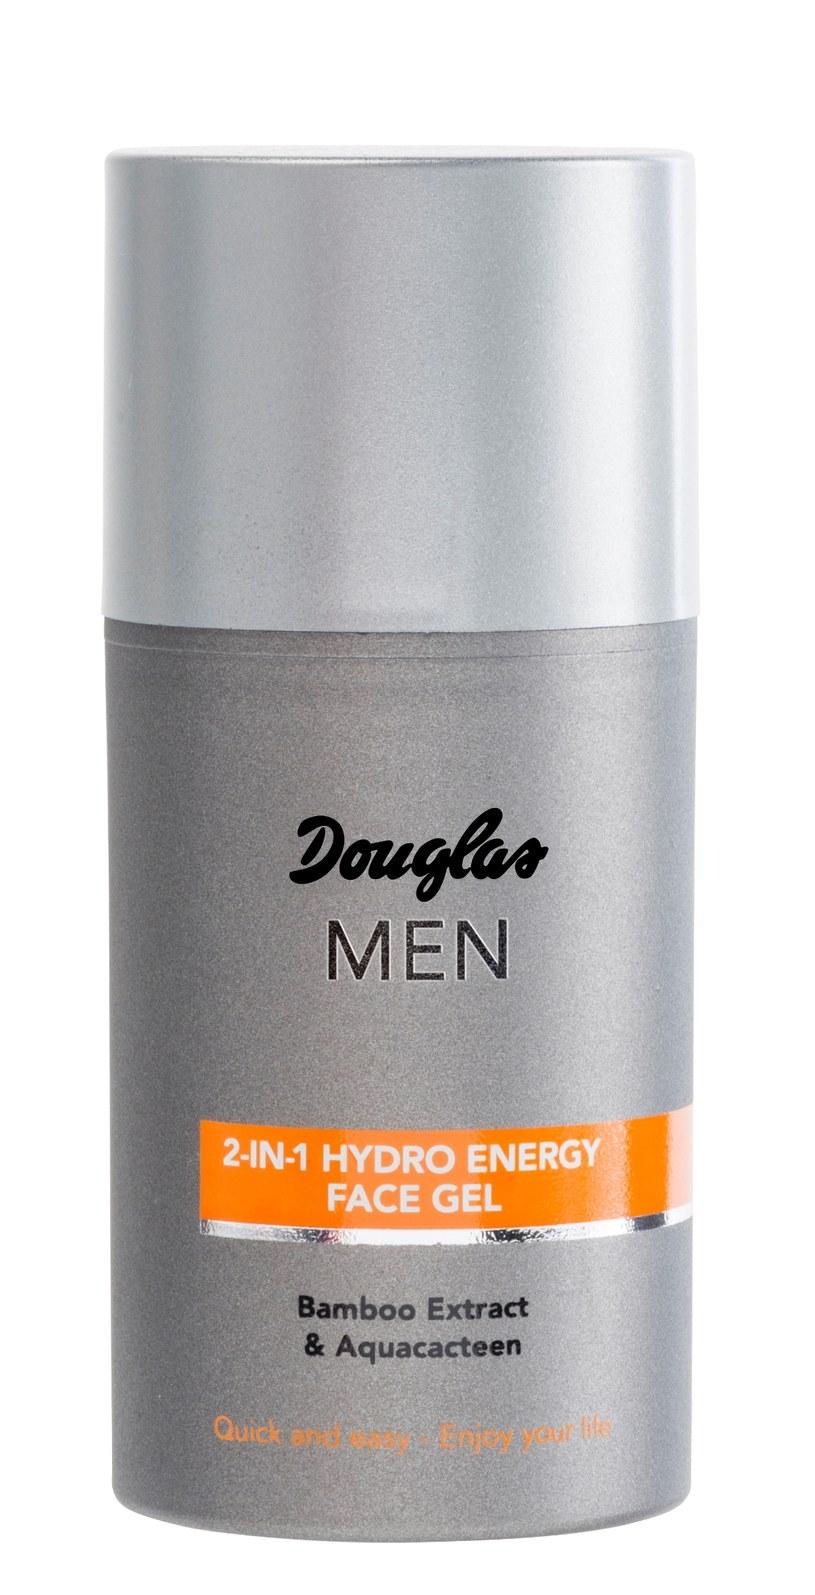 2 in 1 Hydro Energy Face Gel od Douglas MEN /Styl.pl/materiały prasowe